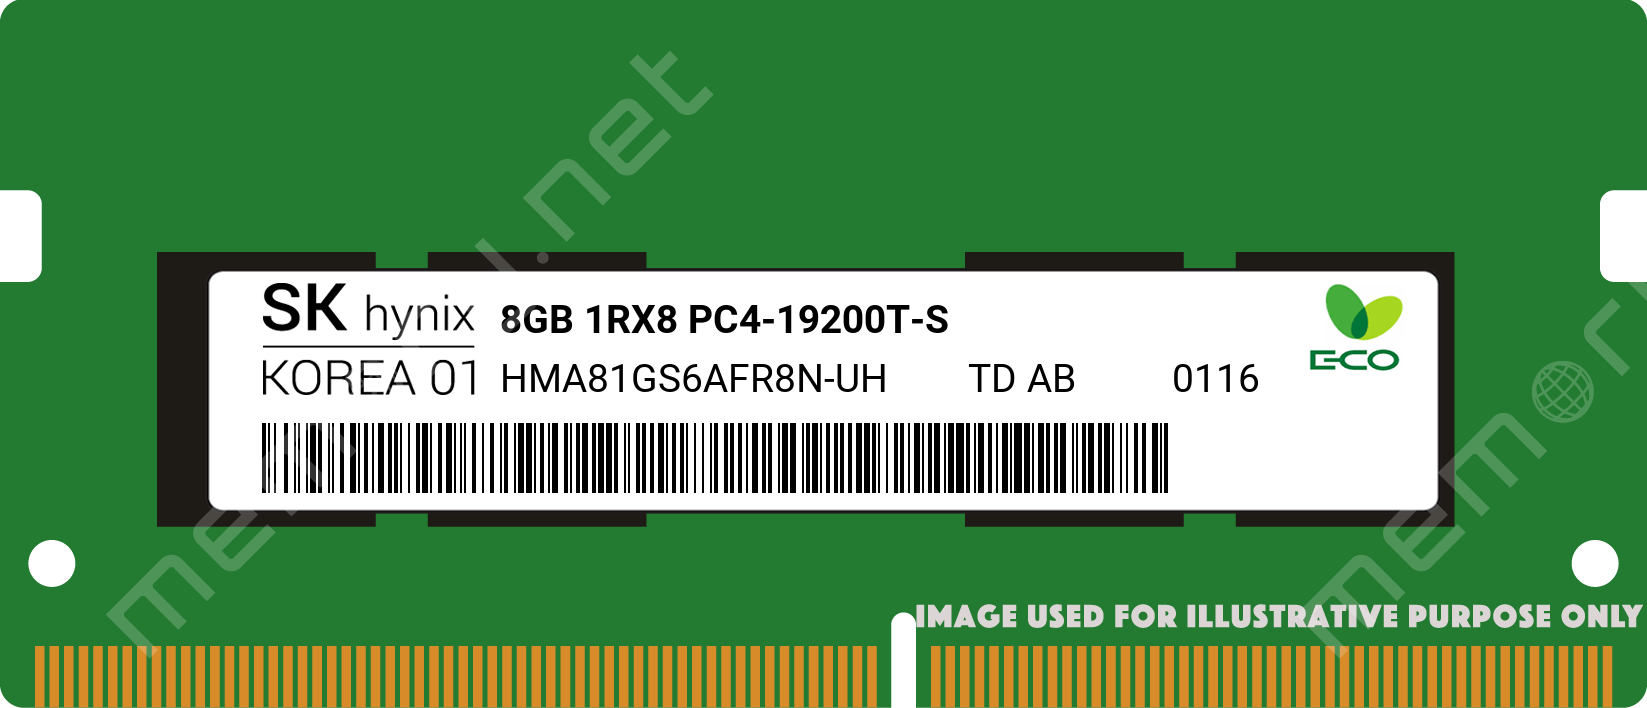 HMA81GS6AFR8N-UH